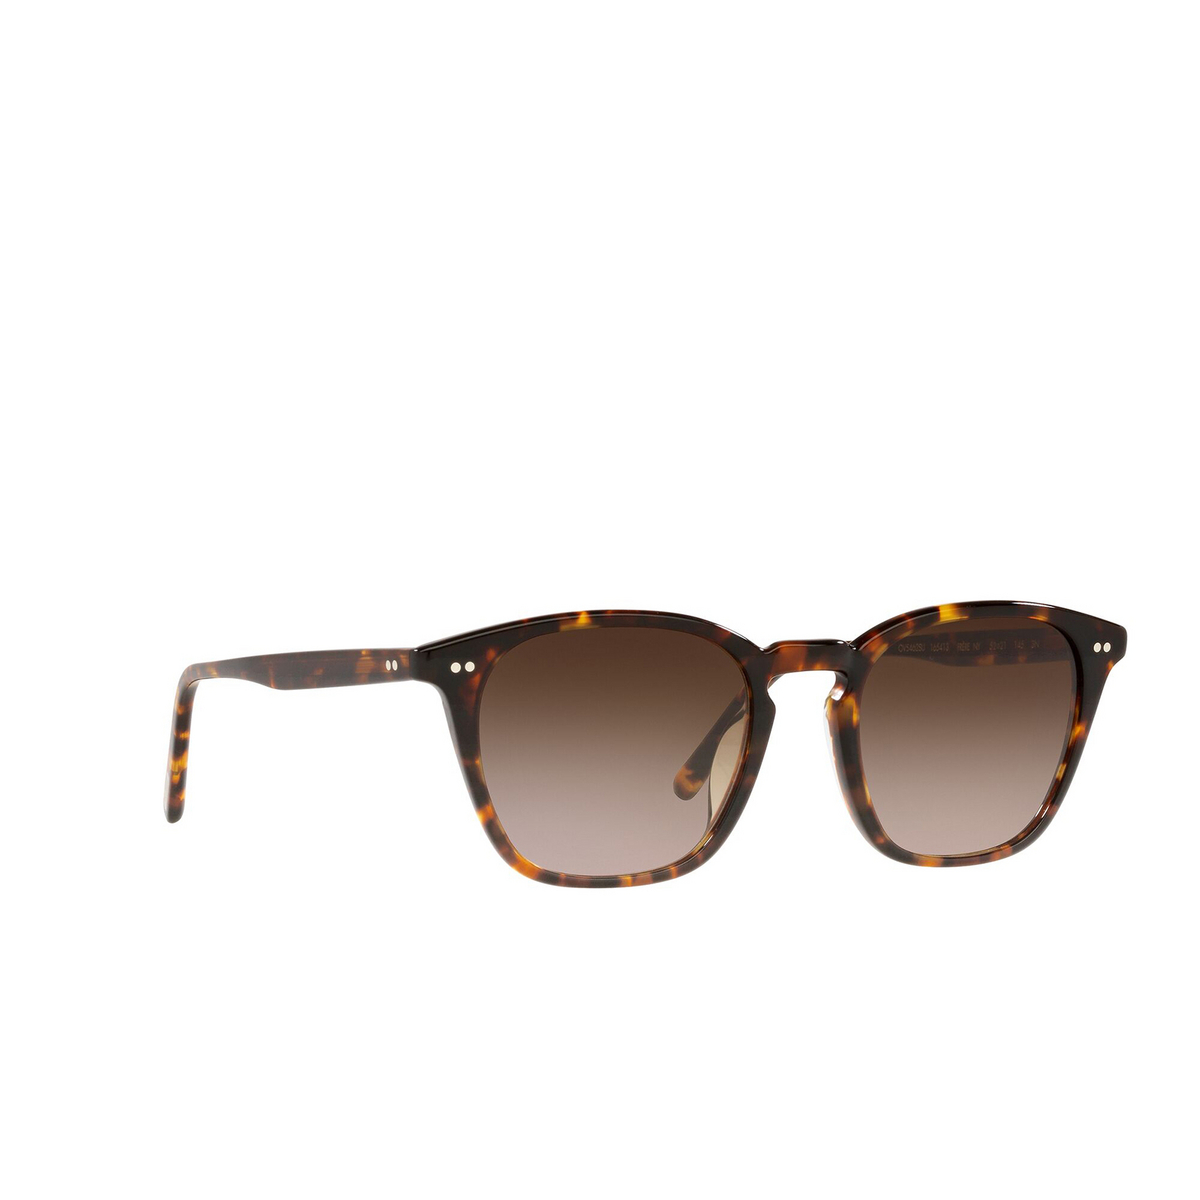 Oliver Peoples® Square Sunglasses: Frère Ny OV5462SU color Dm2 165413 - three-quarters view.